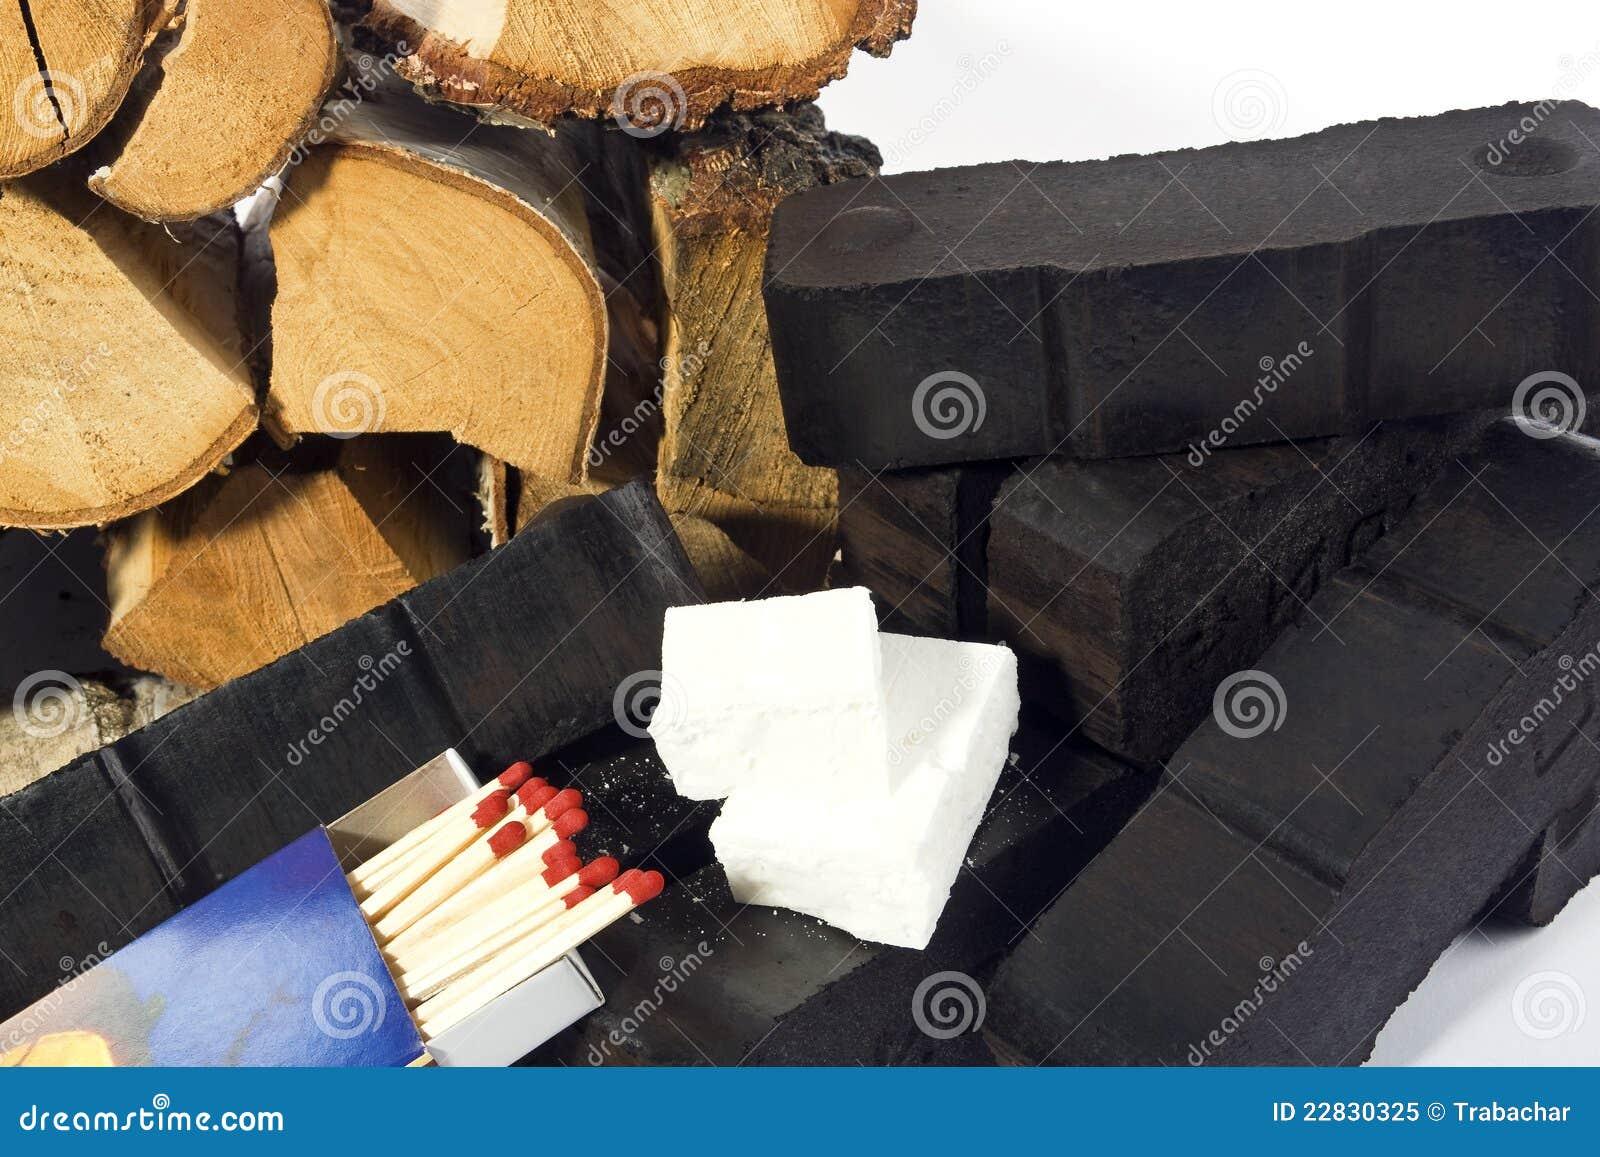 chauffage avec du charbon 1 image stock image du firelighters chemin e 22830325. Black Bedroom Furniture Sets. Home Design Ideas